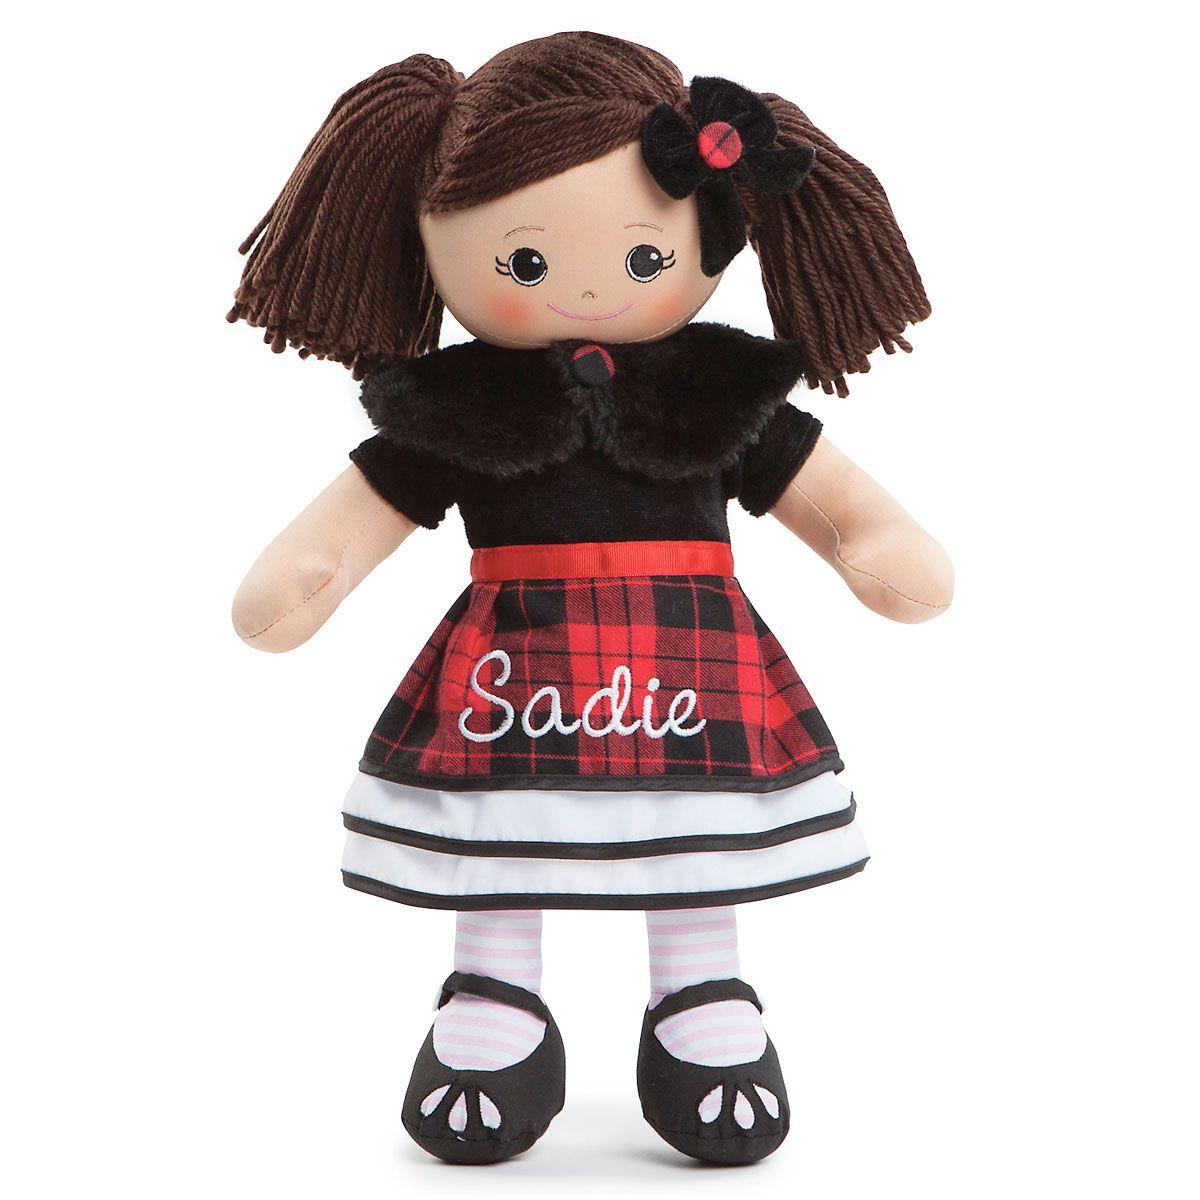 Hispanic Rag Doll in Plaid Dress